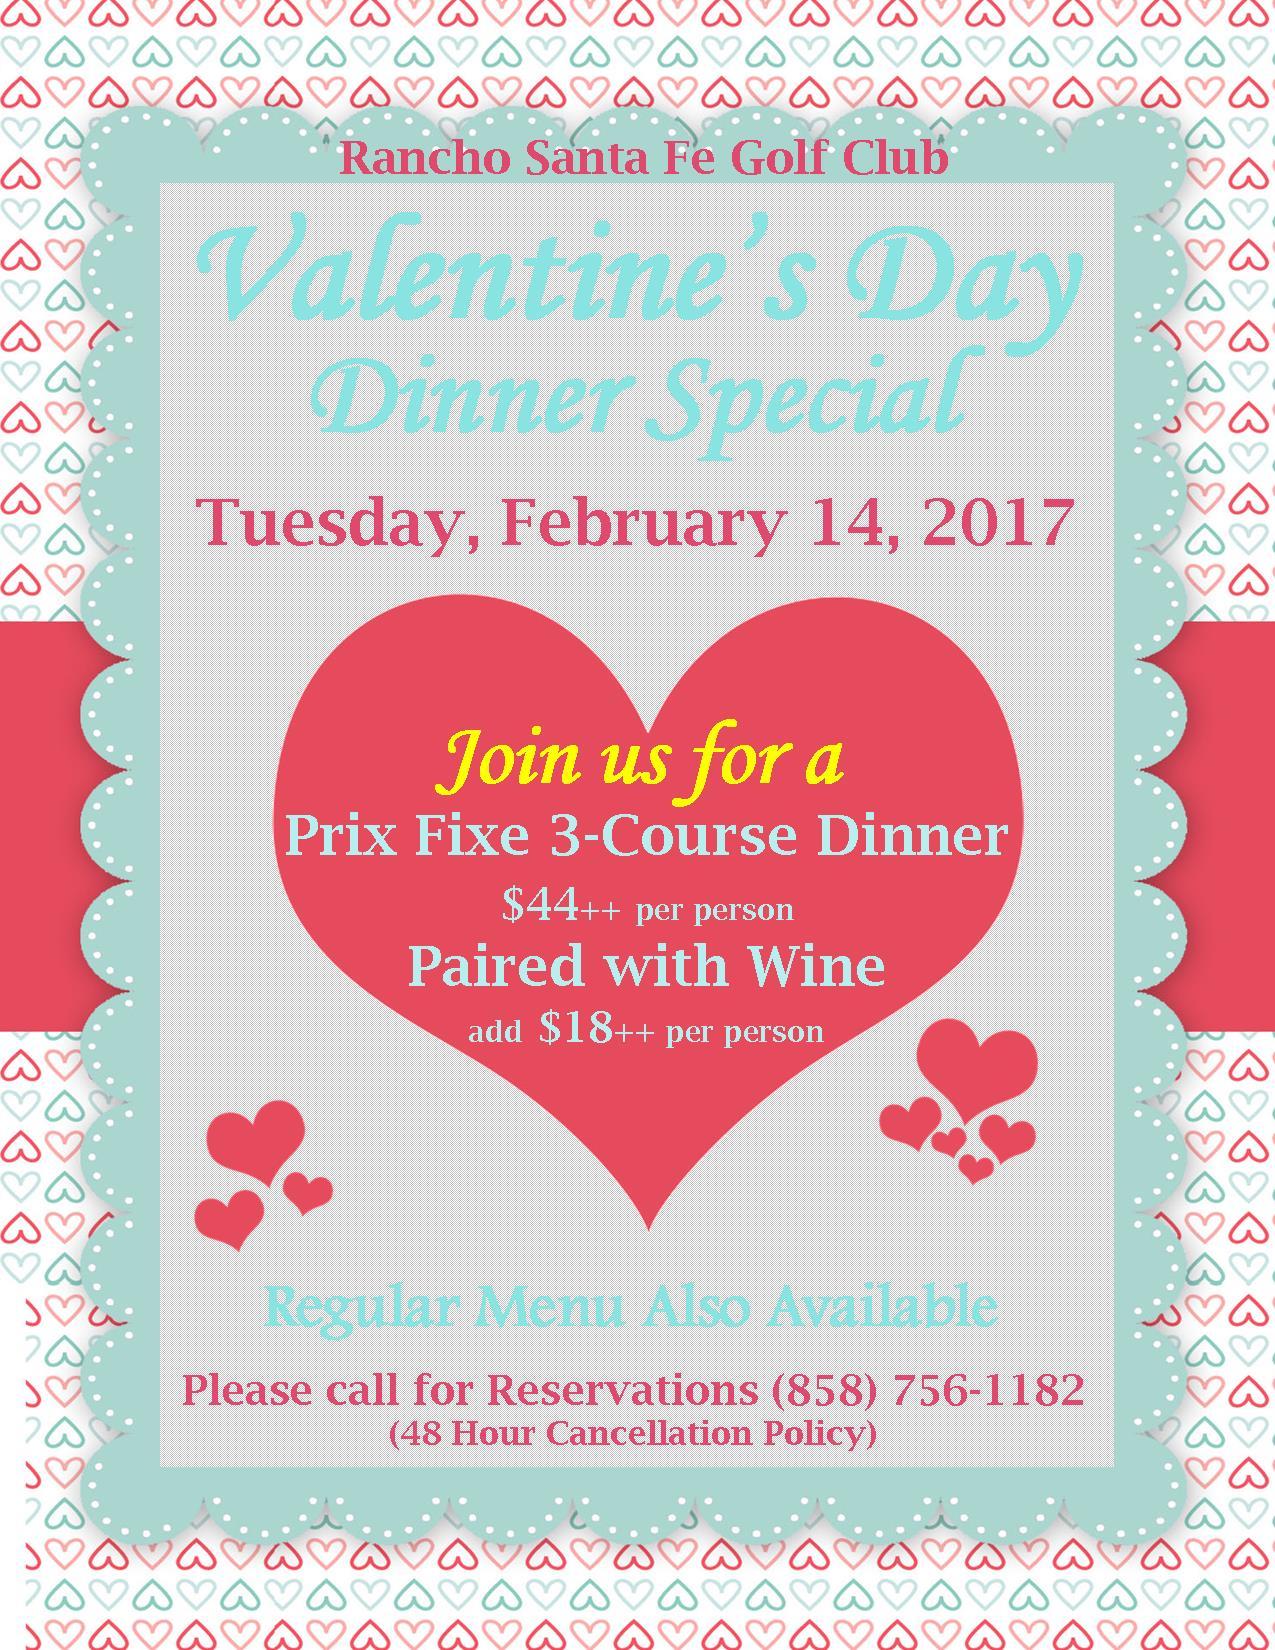 ValentinesDay2017.jpg